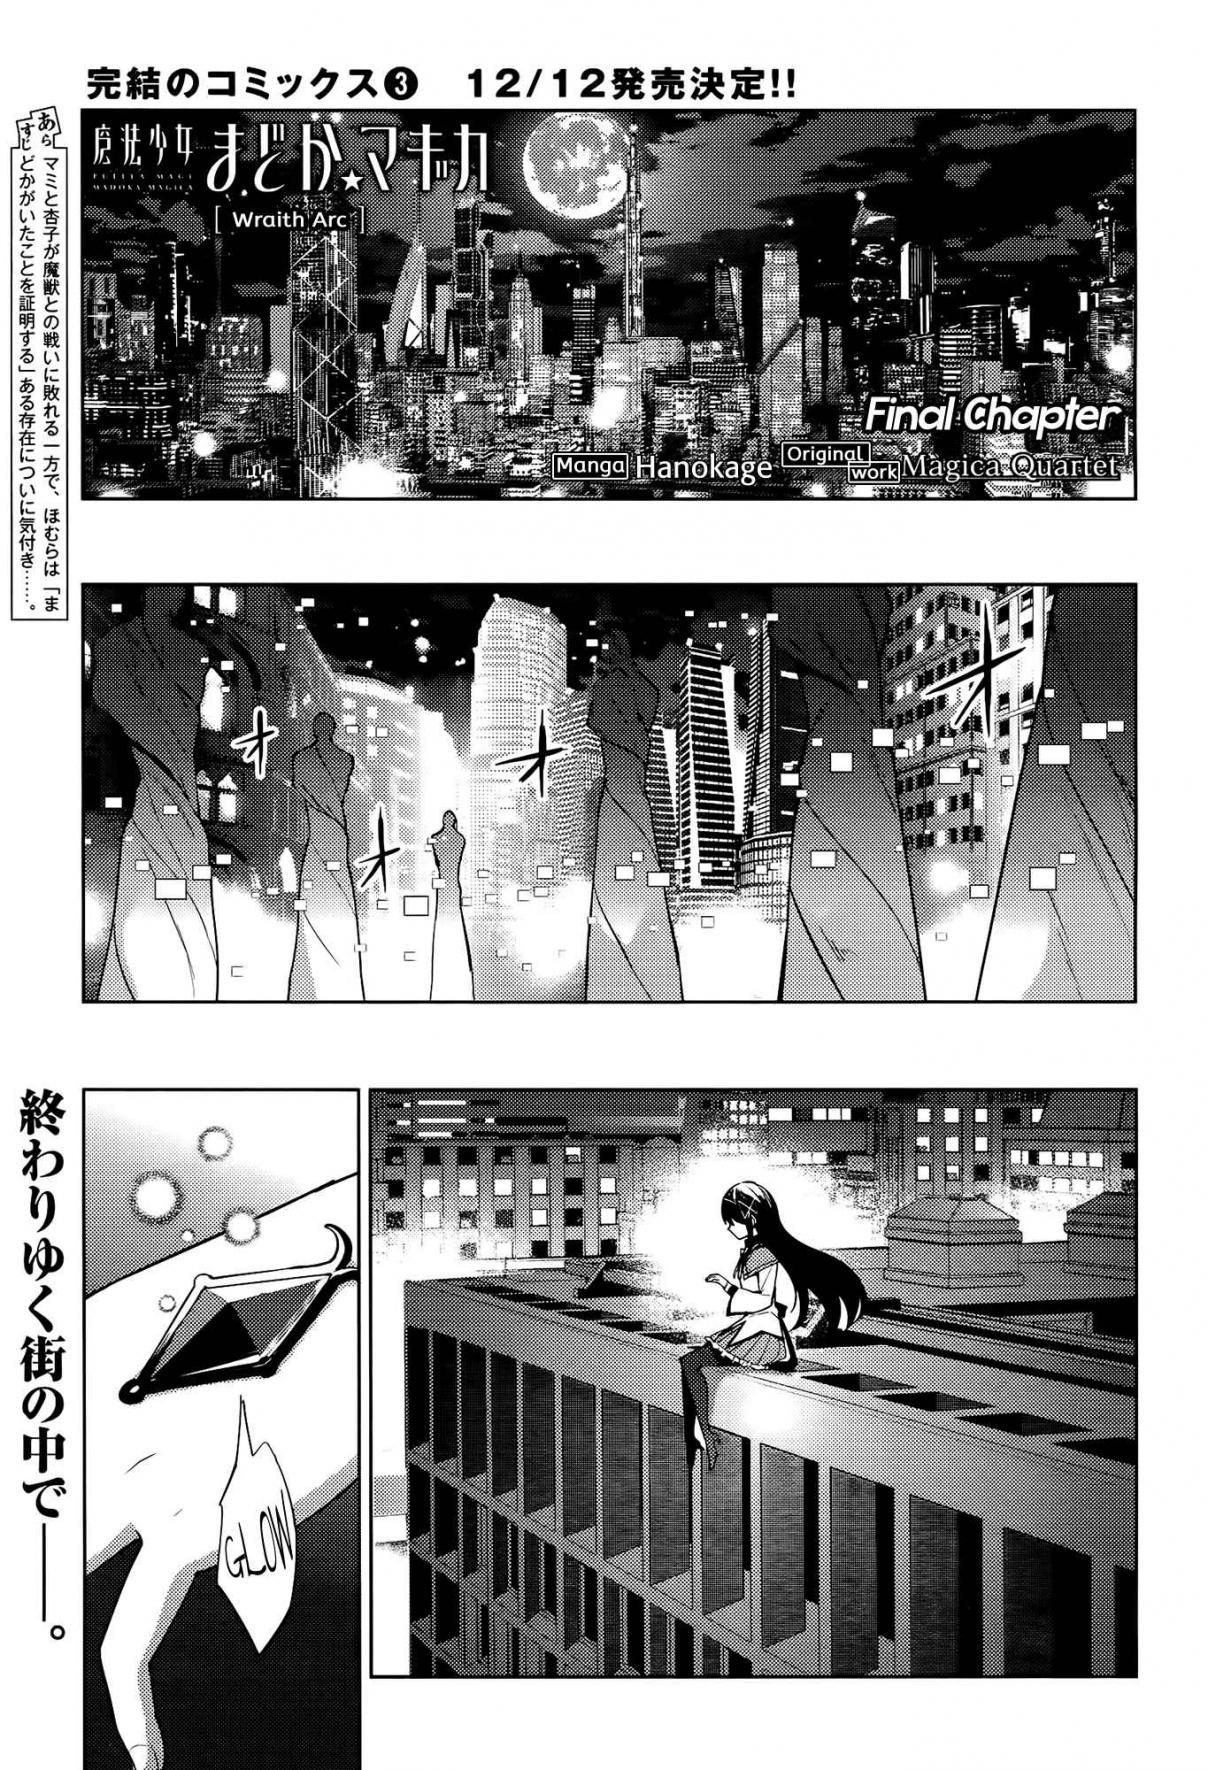 https://img2.nineanime.com/comics/pic2/36/31716/881158/1d8db5bc9930400d8959c99c440fc254.jpg Page 1